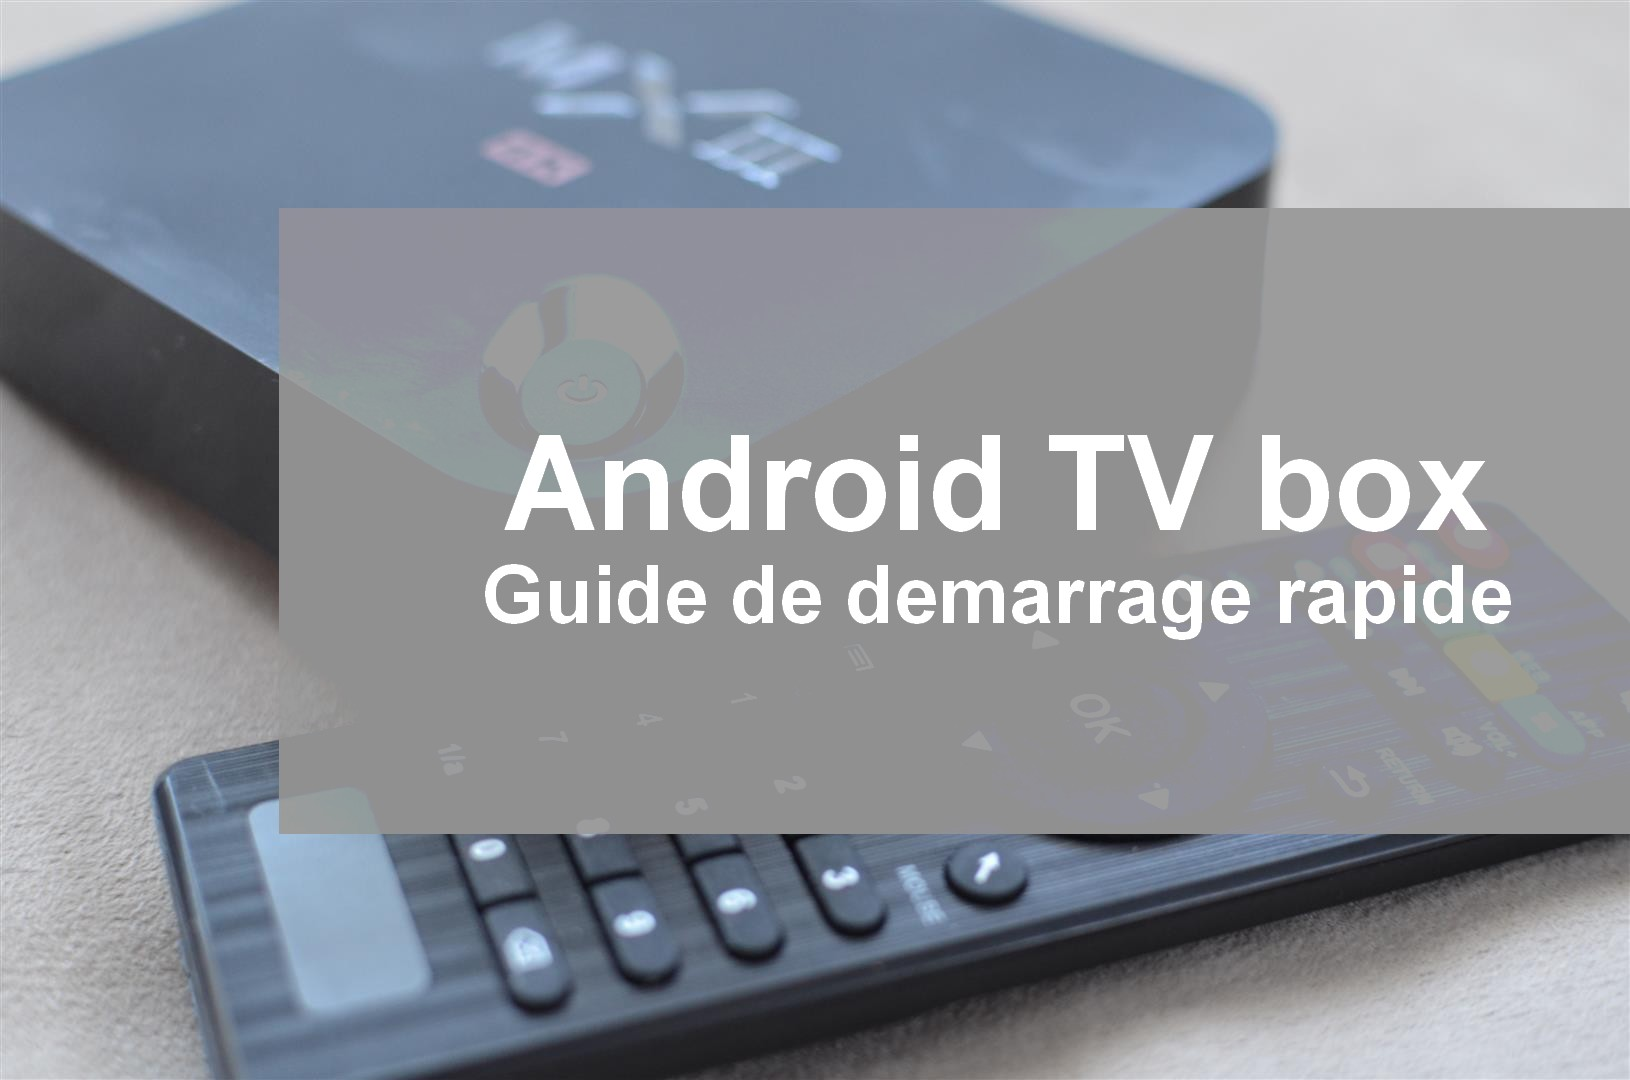 Android TV box : Guide de démarrage rapide - Android TV Box